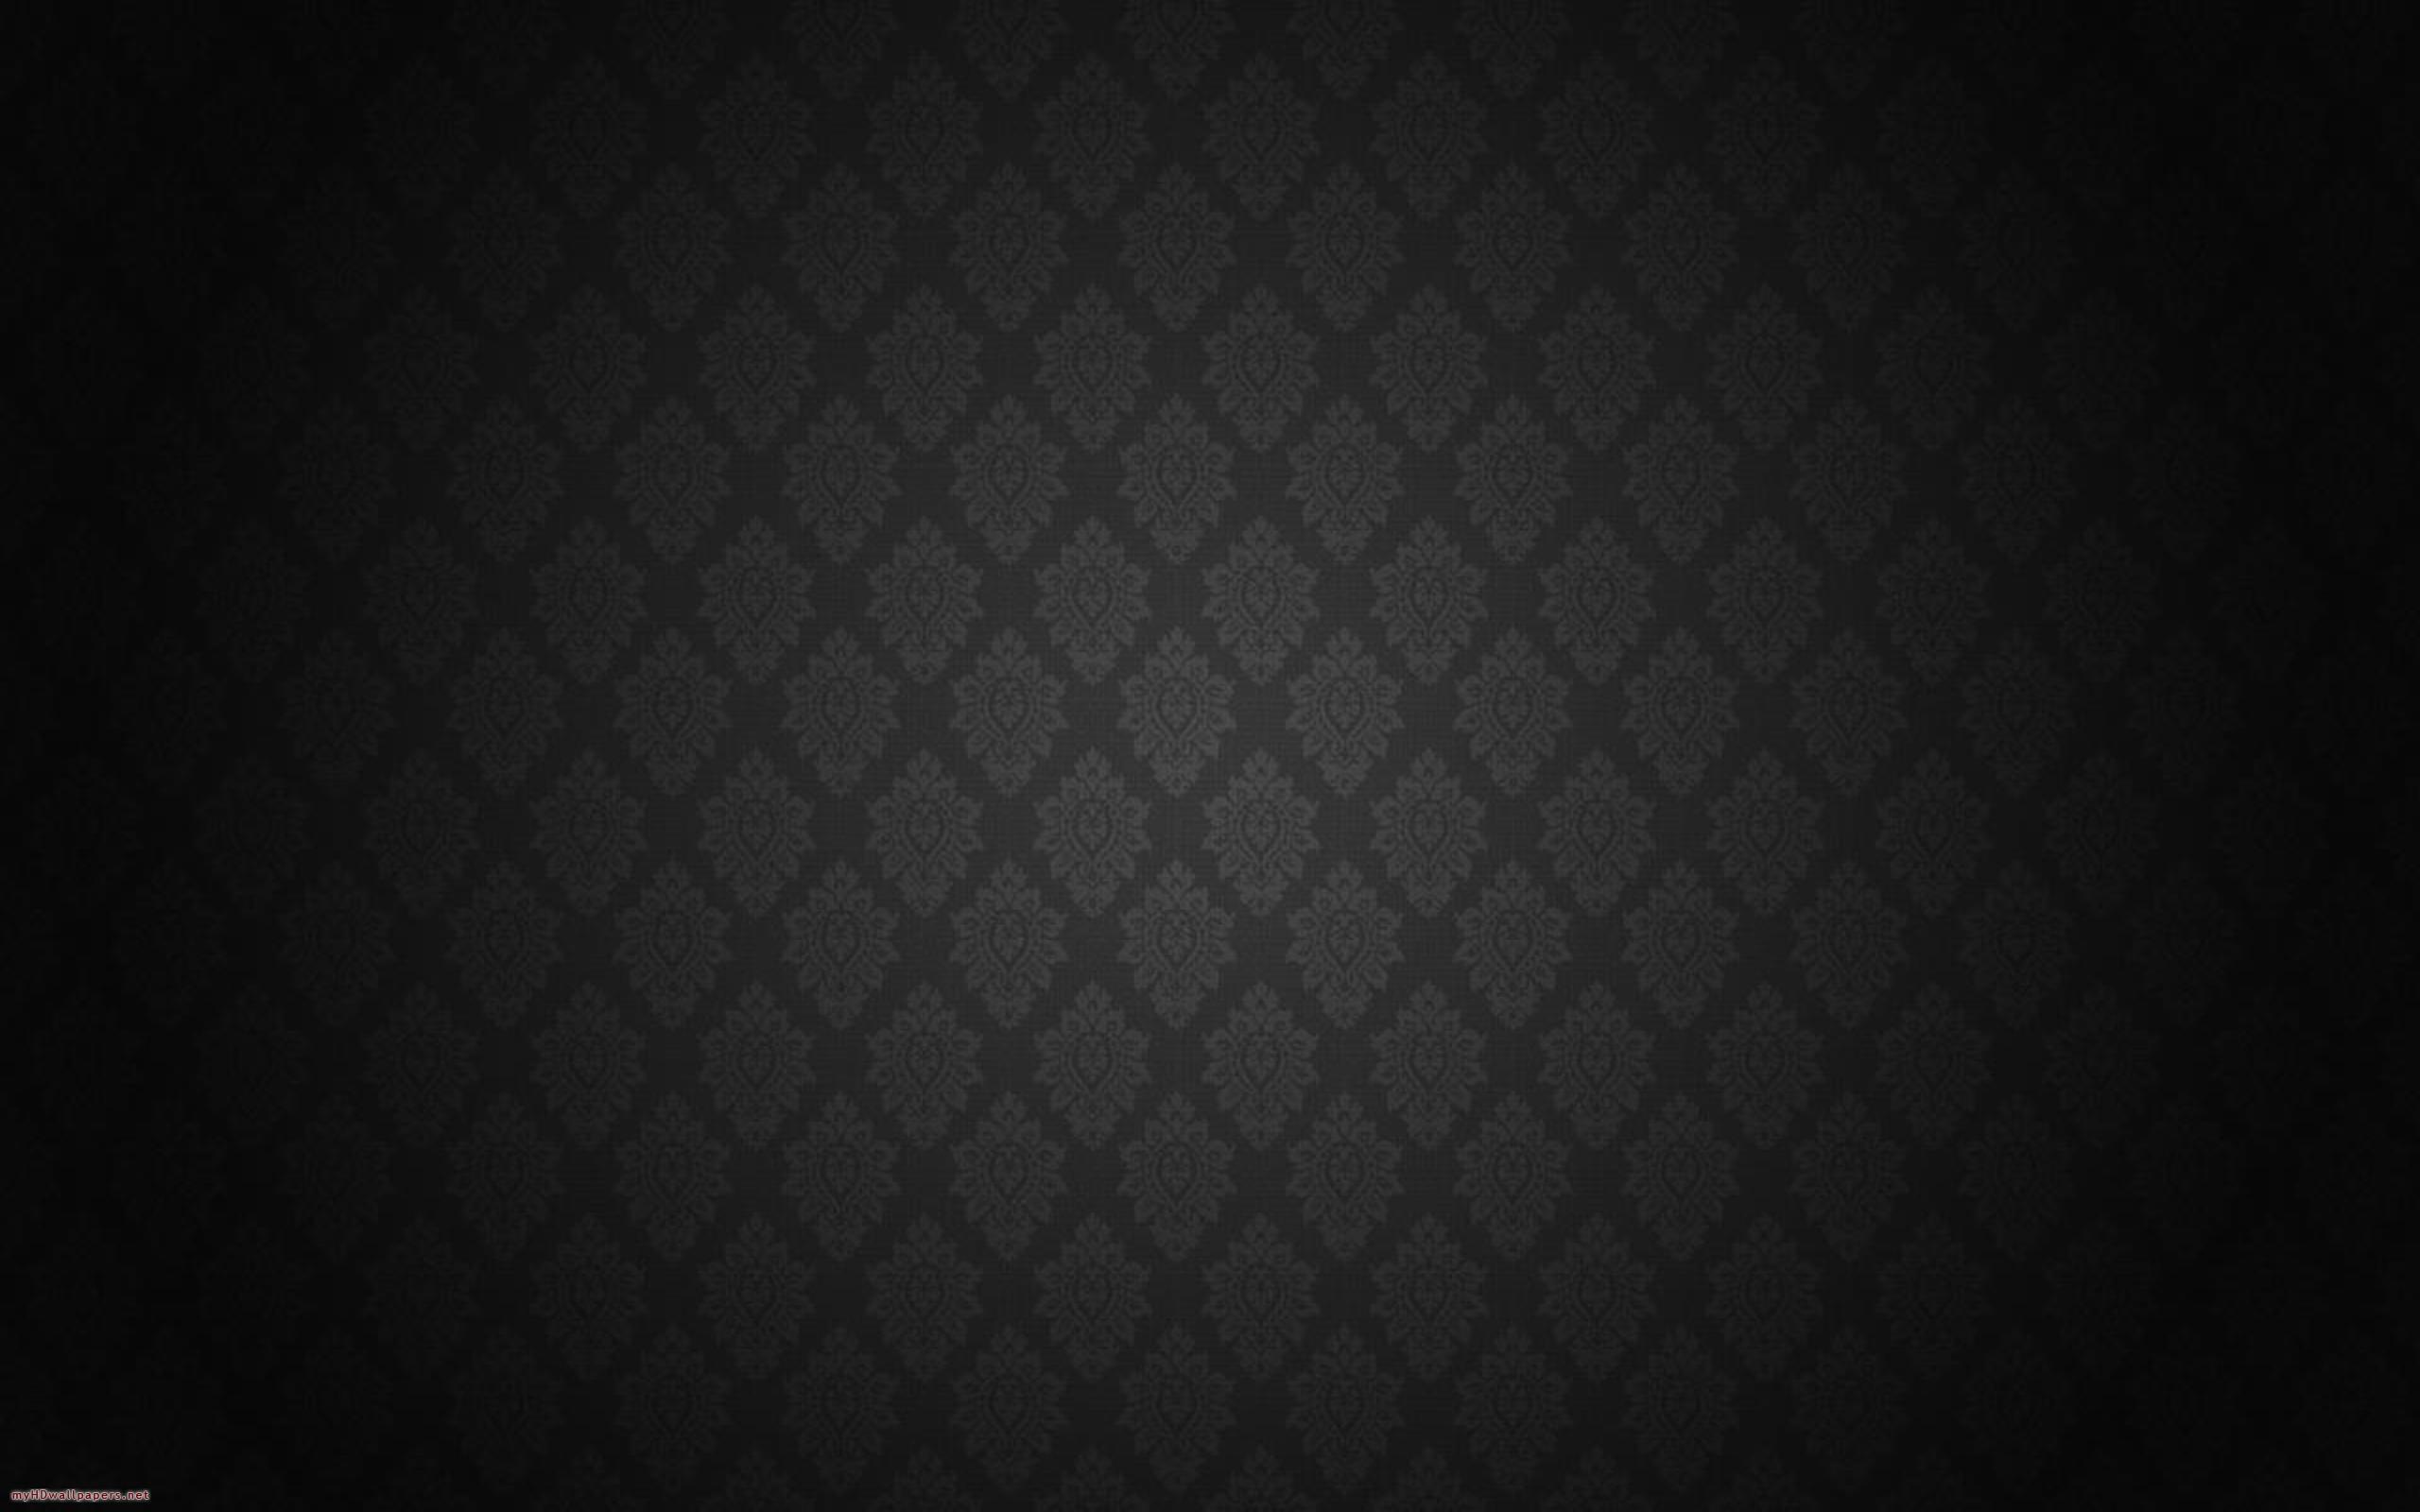 ... Black-and-white-wallpaper-23 ...